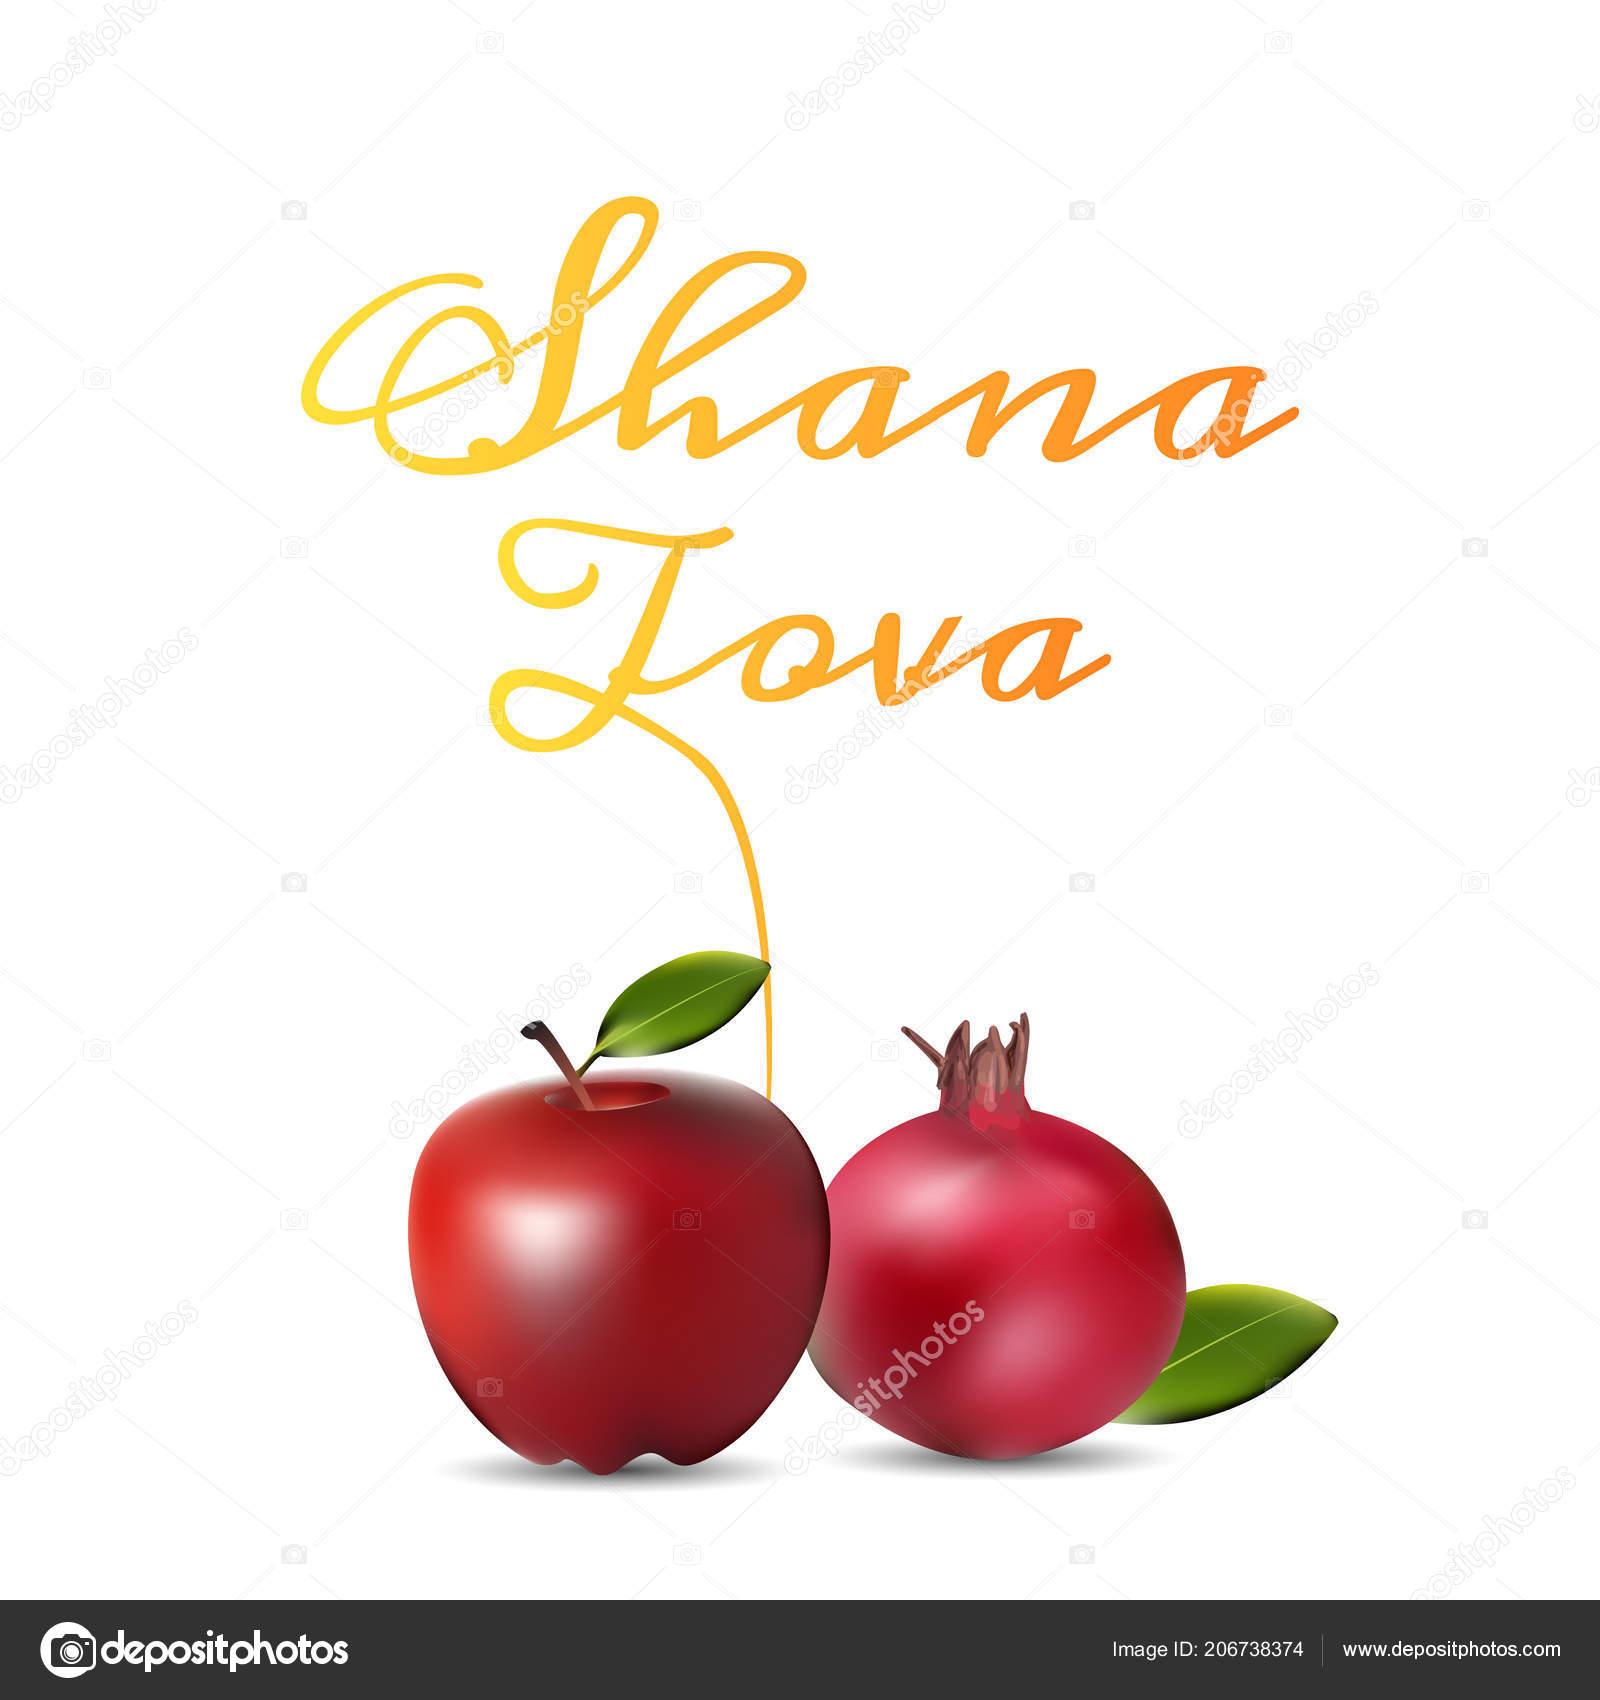 Shana tova greeting card poster design illustration stock vector shana tova greeting card poster design illustration stock vector m4hsunfo